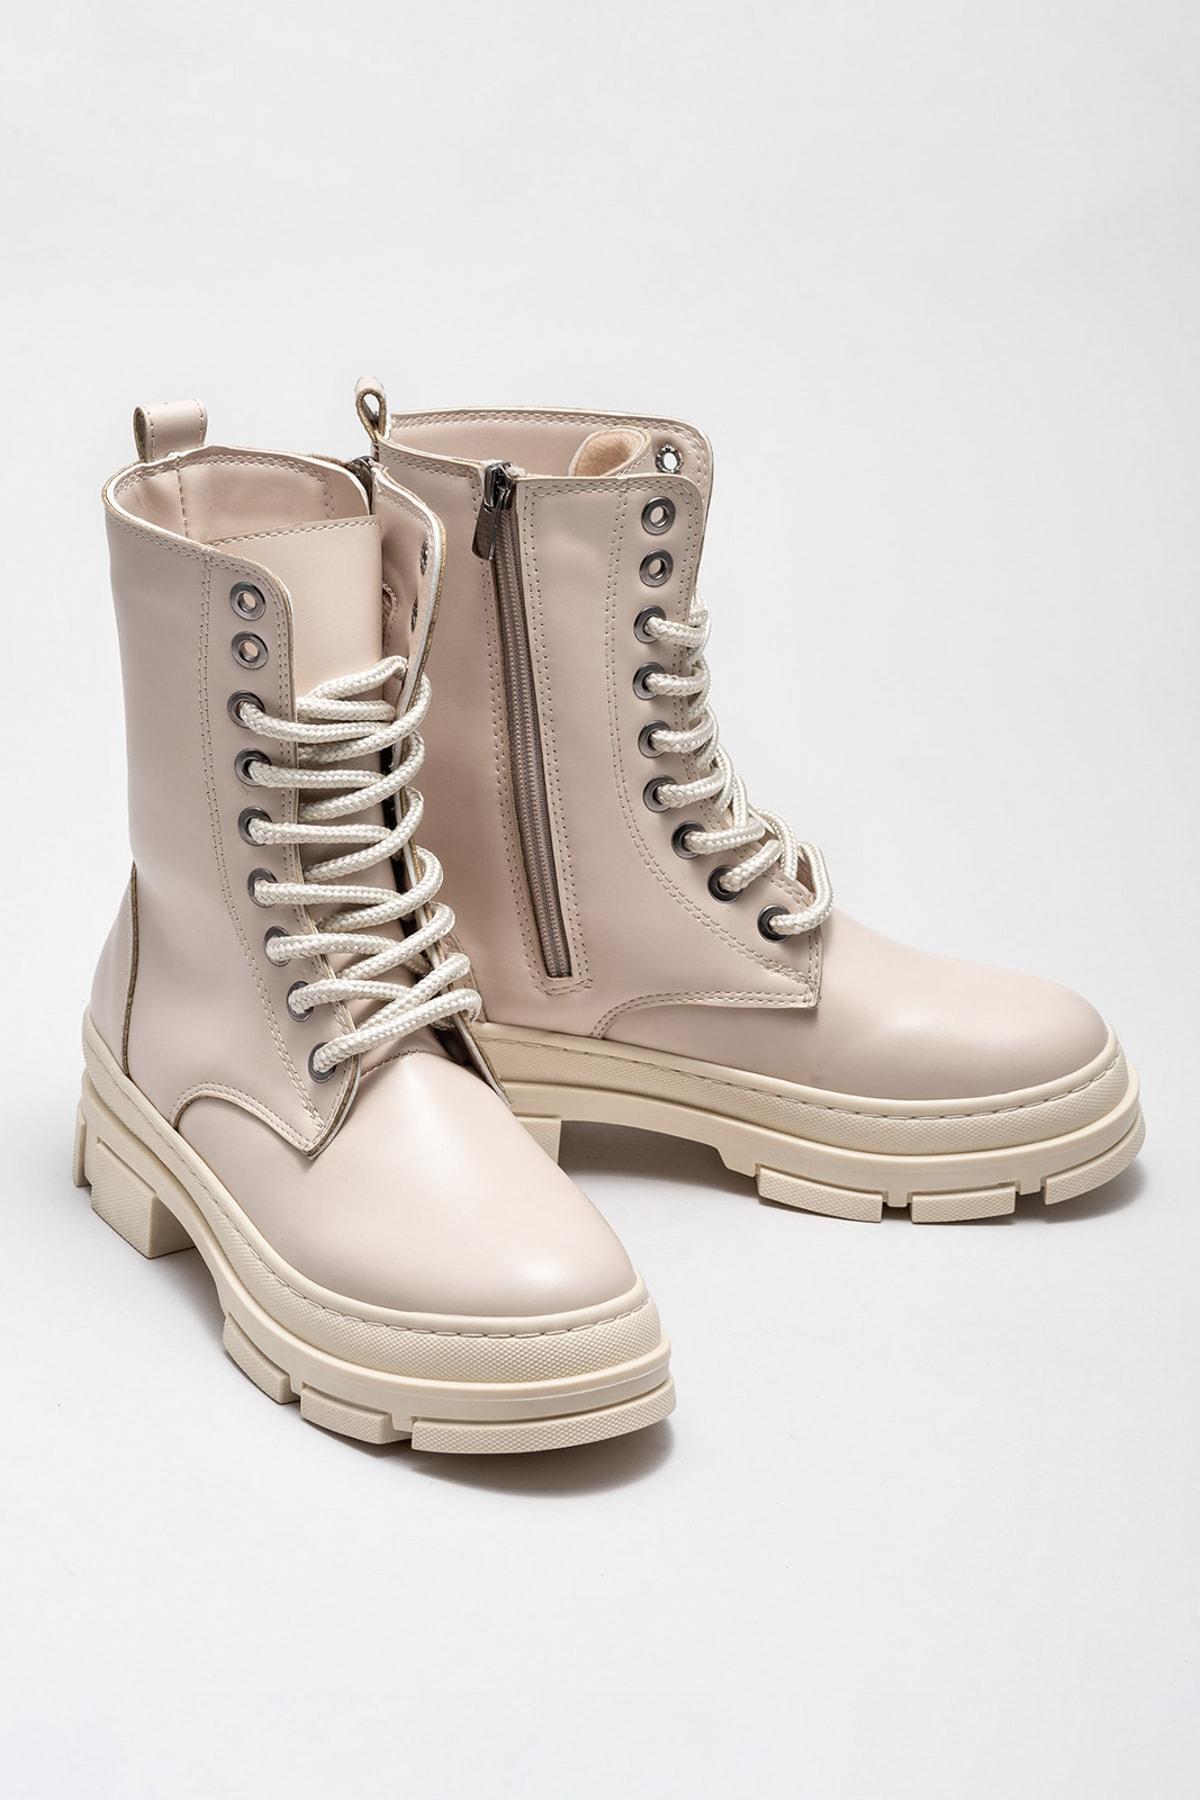 Elle Shoes Kadın Pompey Bej Bot & Bootie 20KAD3434-04 2